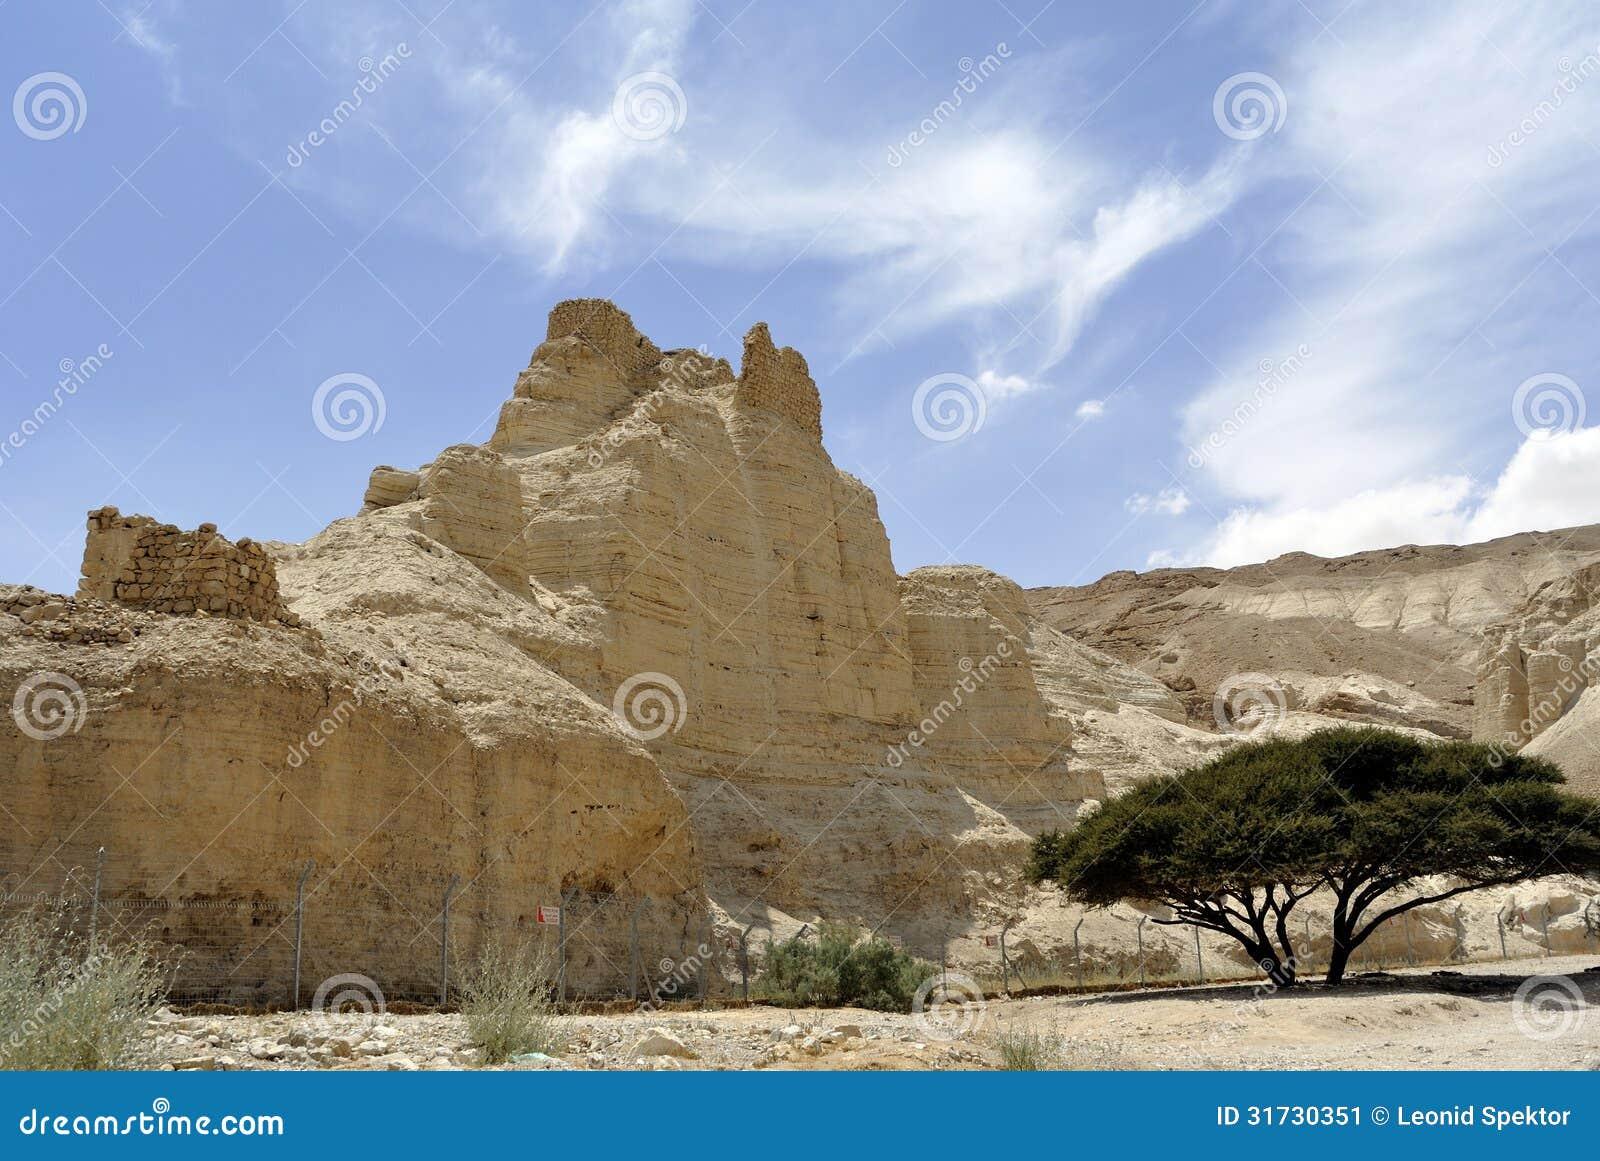 Fortaleza de Zohar no deserto de Judea.